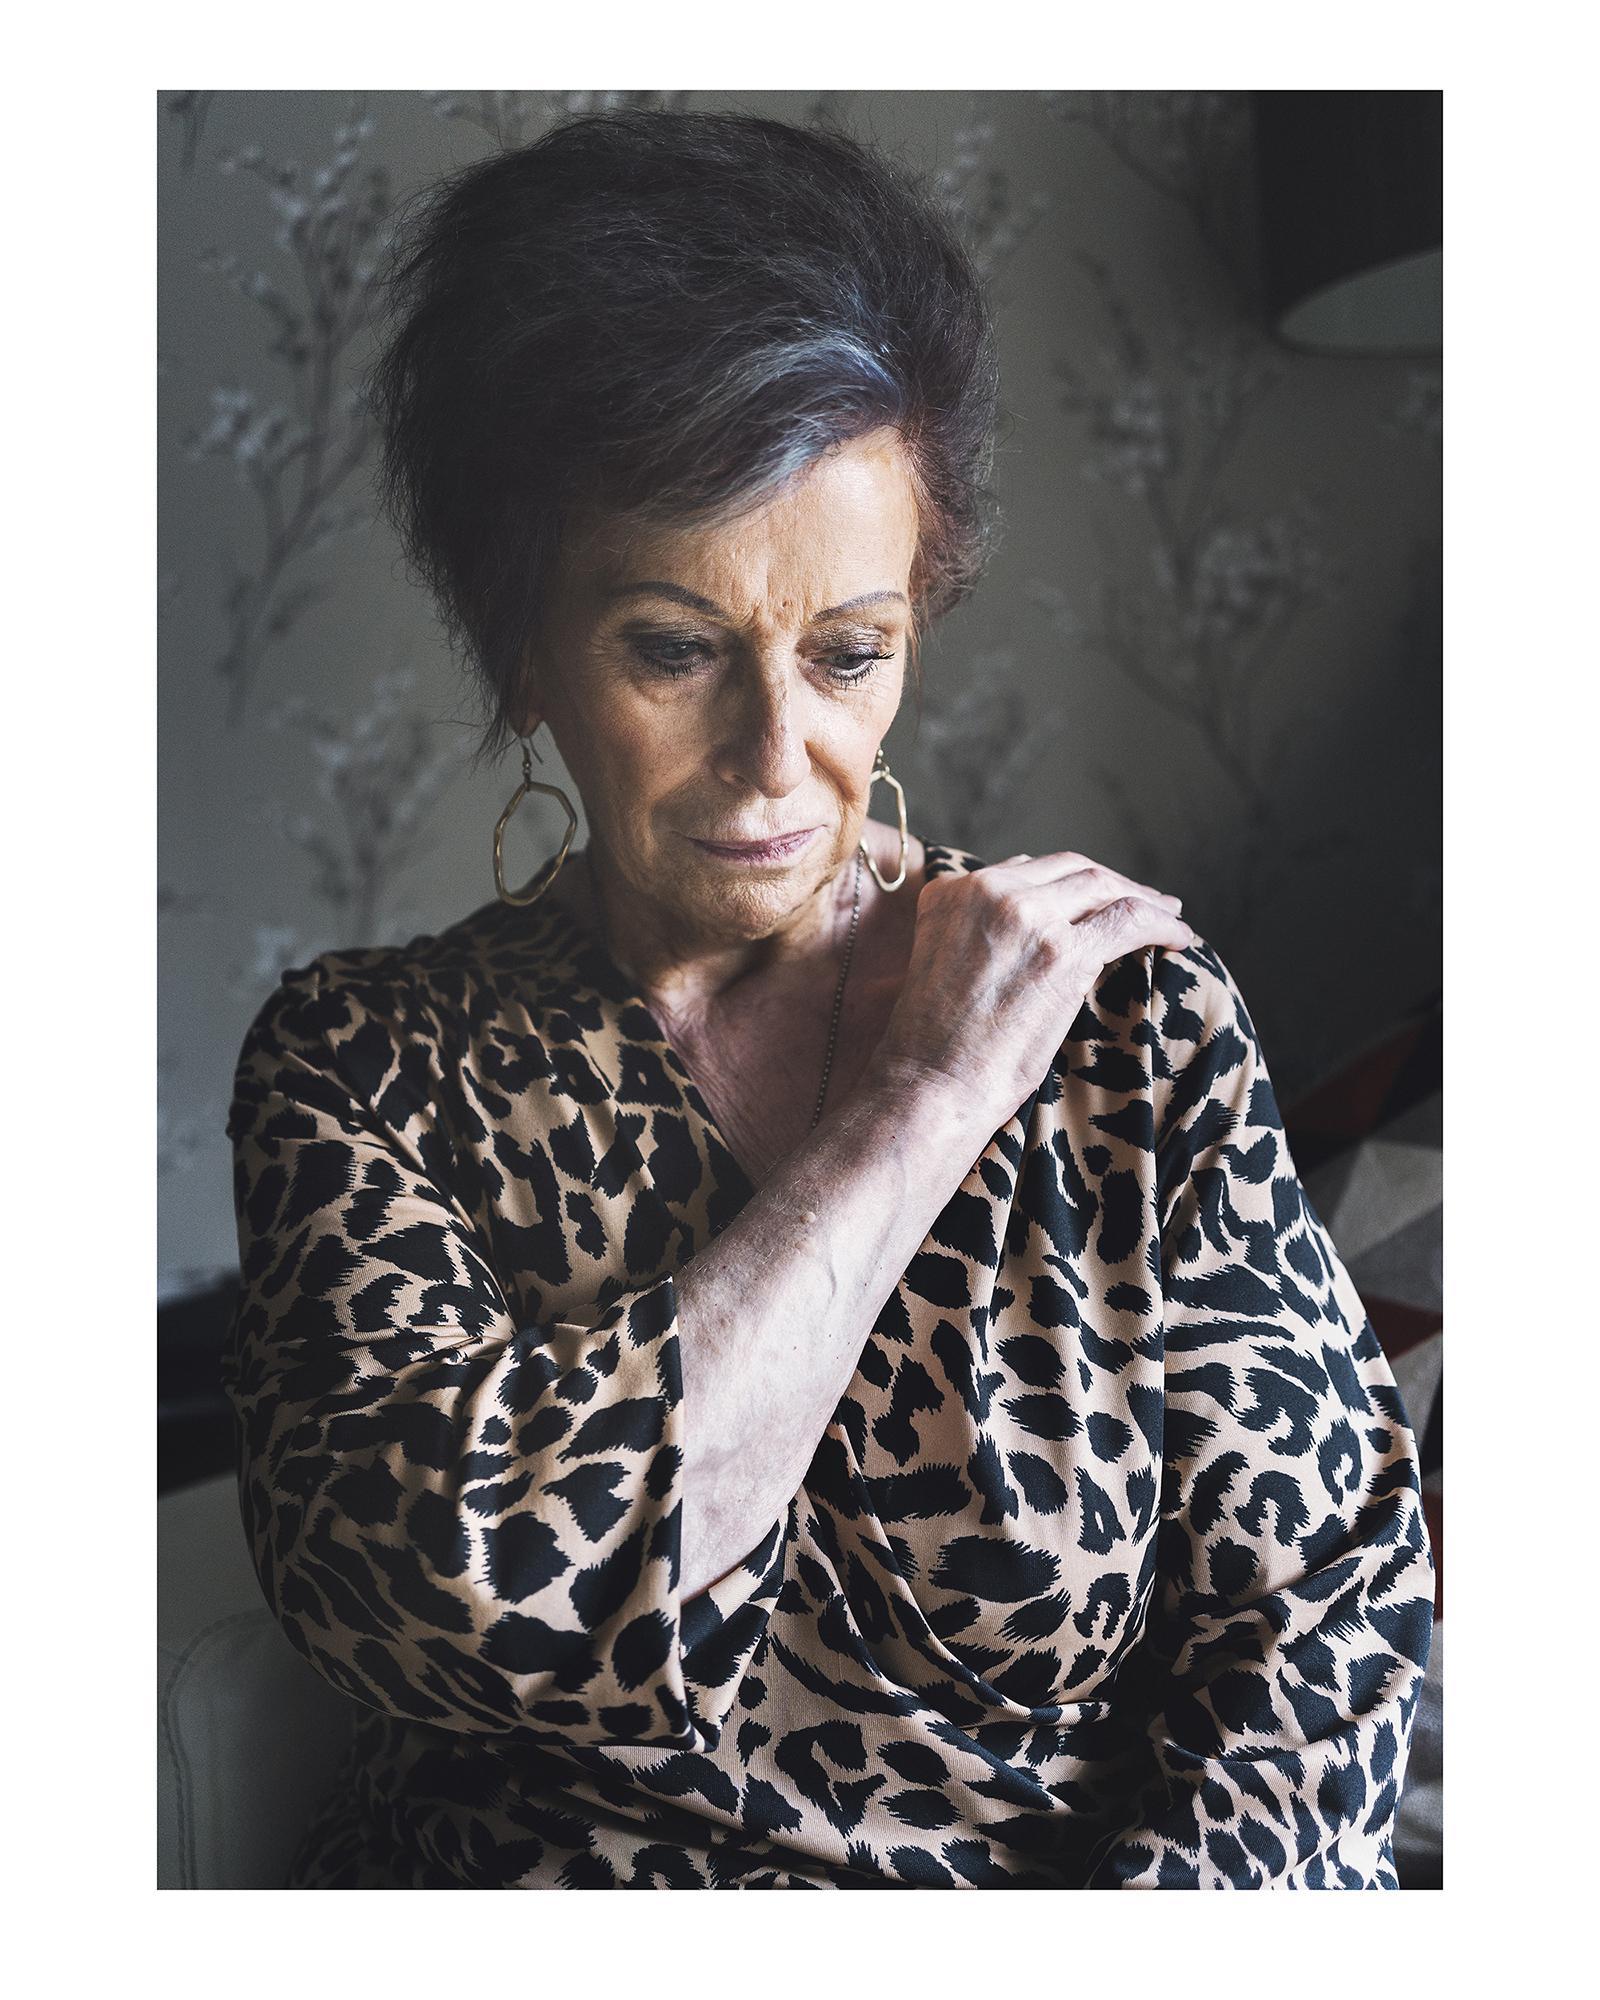 Image of Maureen by Doro Zinn